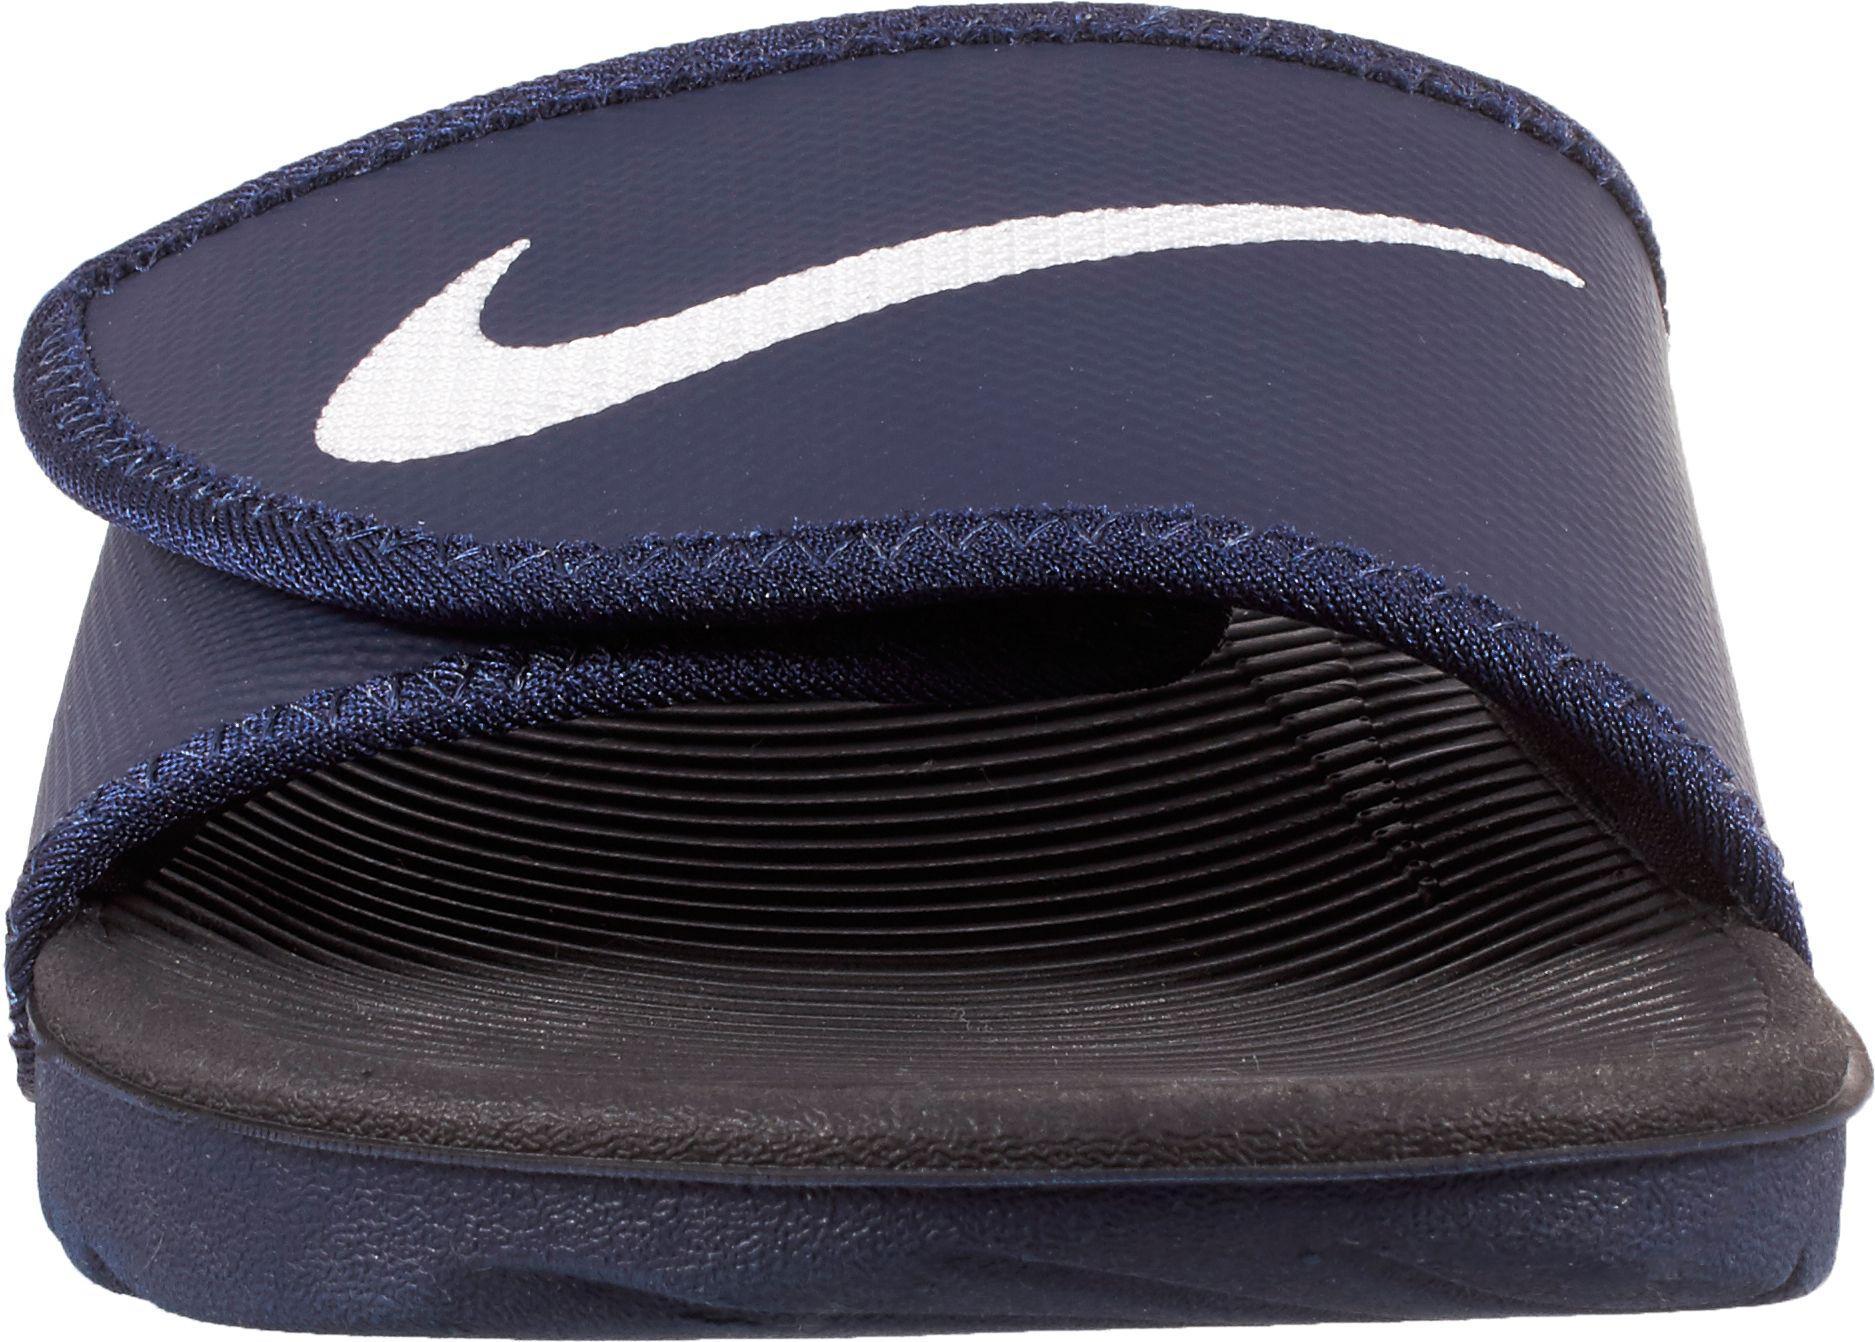 Nike Synthetic Kawa Adjustable Slides